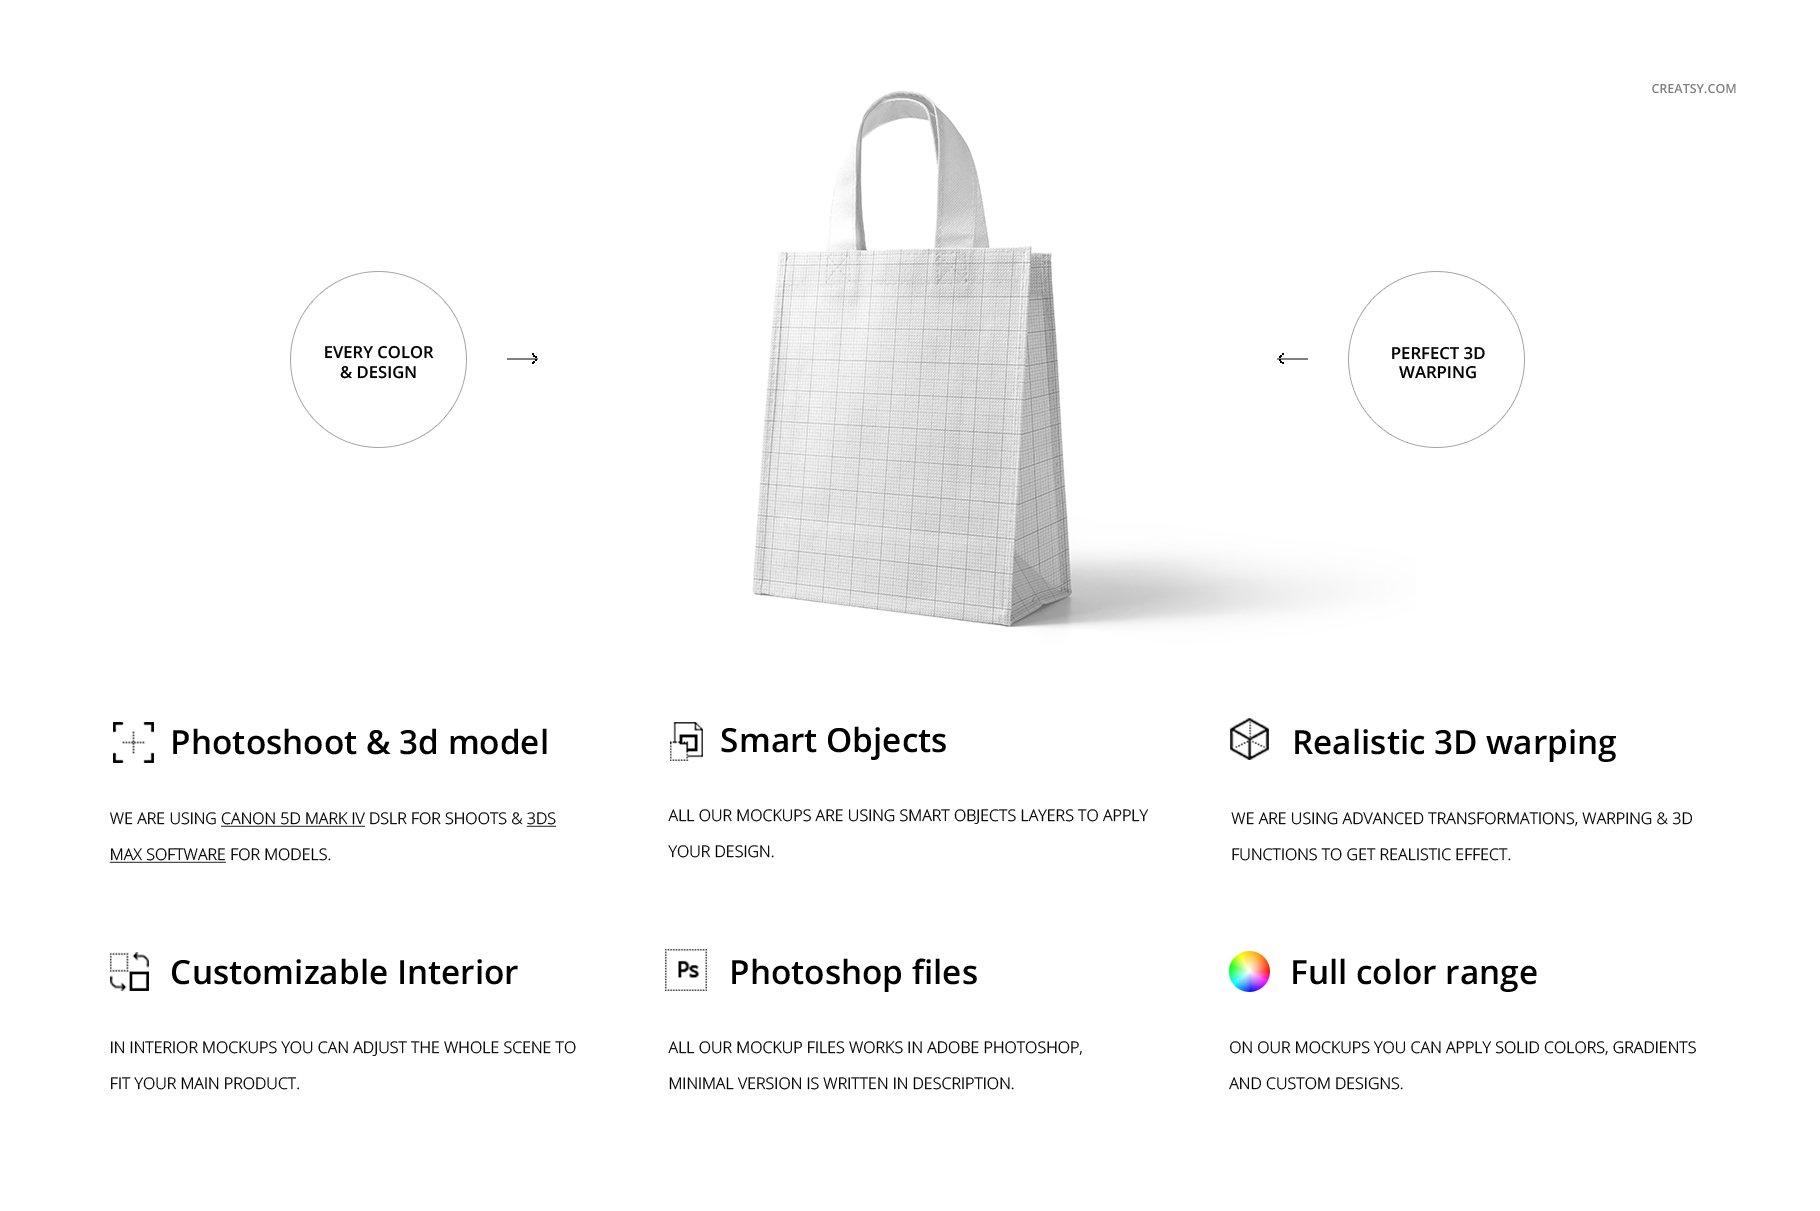 [淘宝购买] 无纺布袋手提袋设计展示样机模板套装 Non-Woven Tote Bag Mockup Set插图(1)